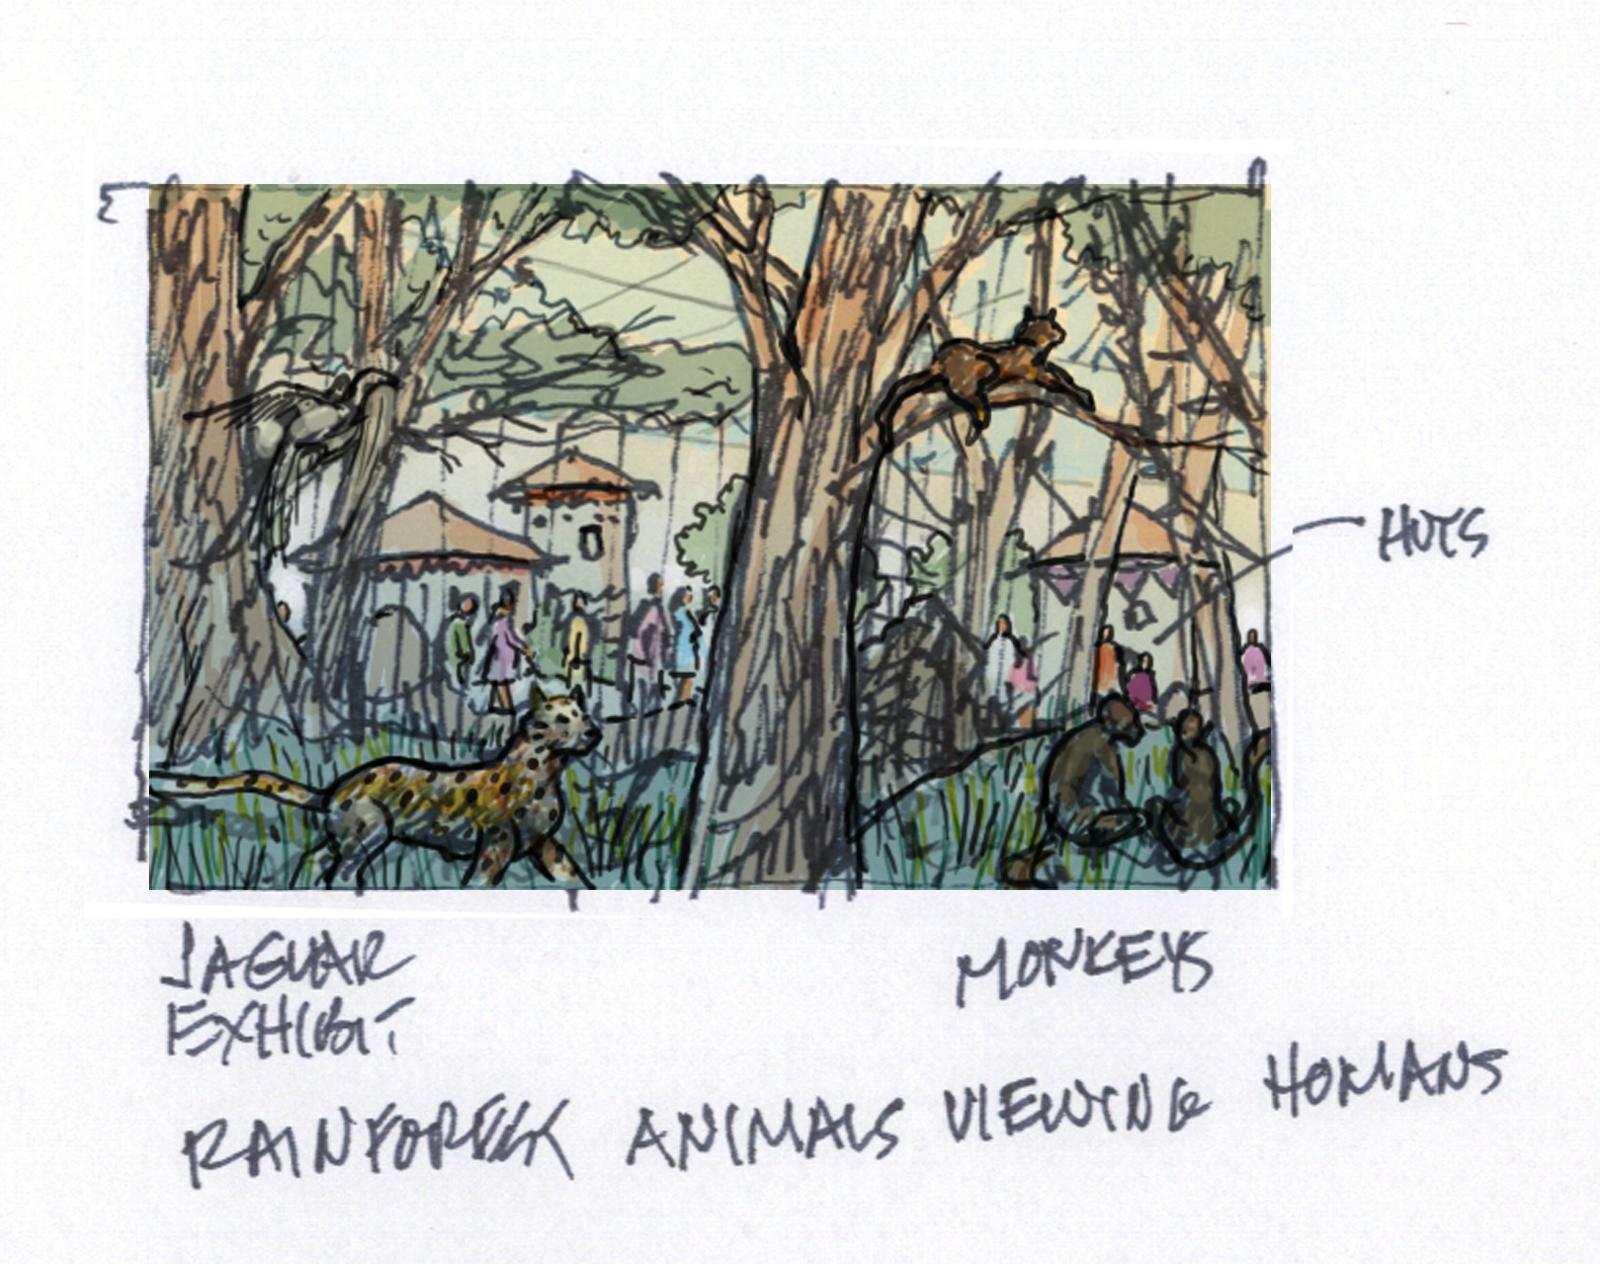 Harbin RainforestAnimals block out copy.jpg